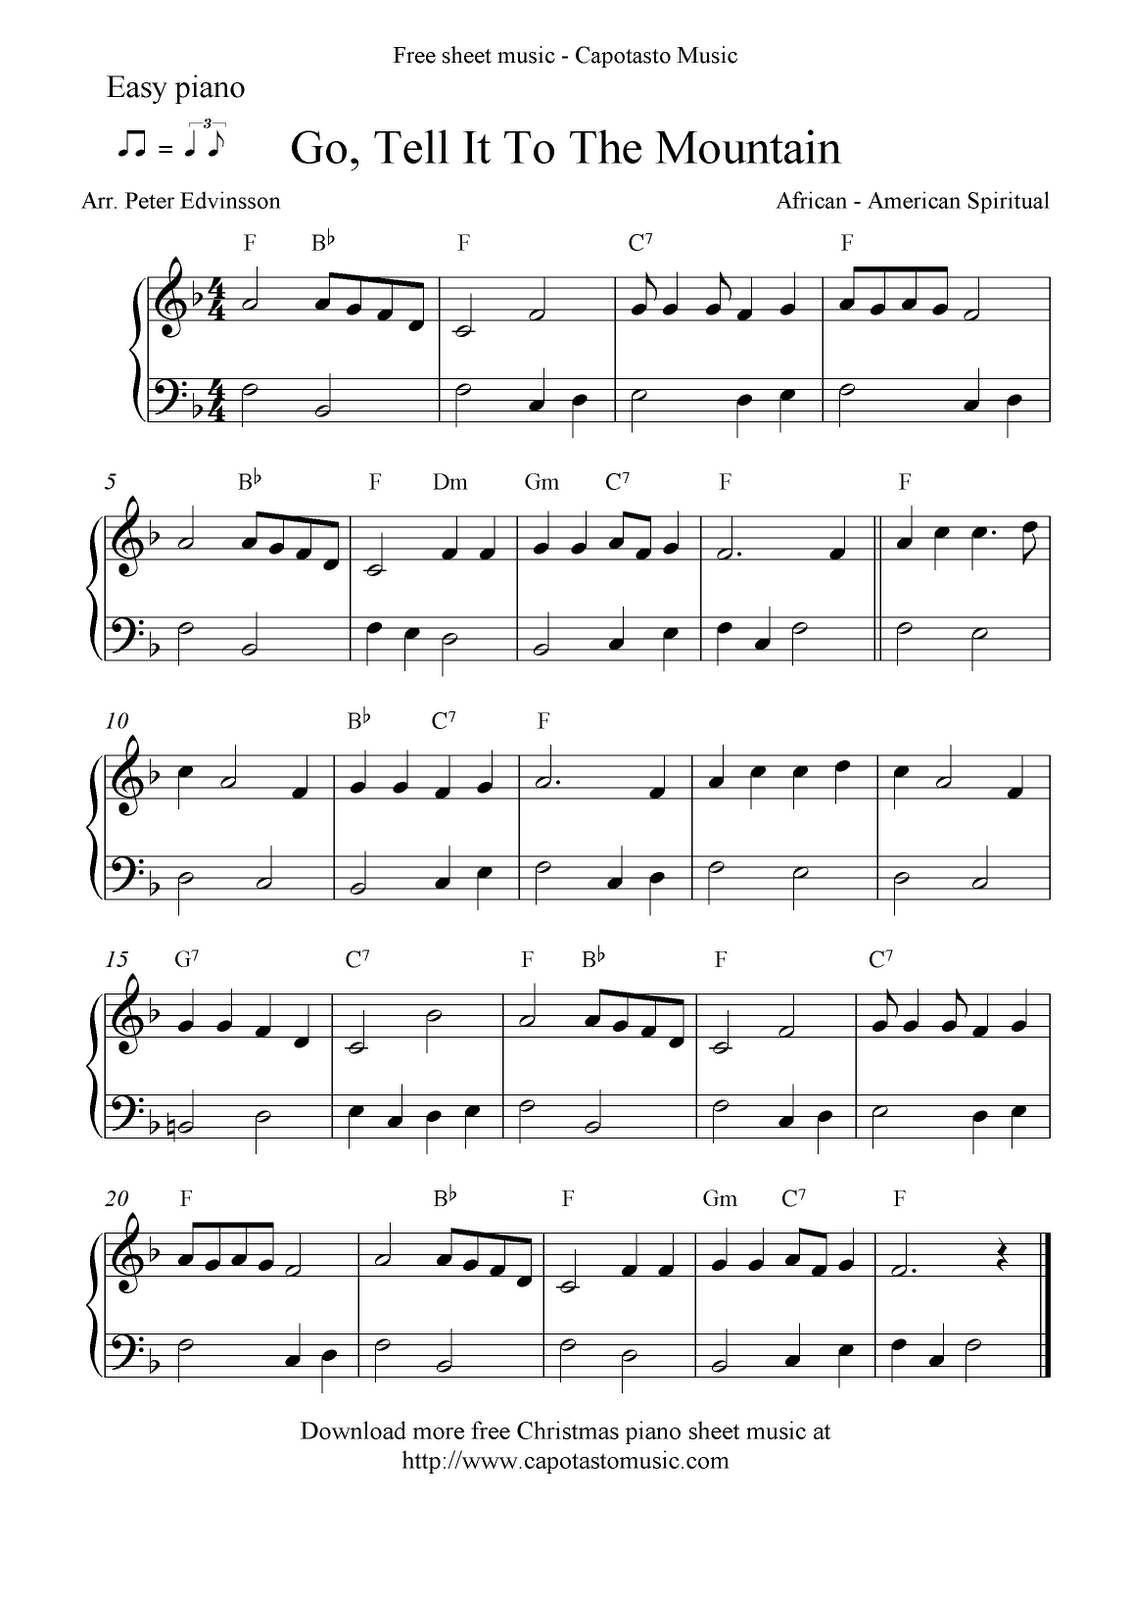 Free Printable Piano Sheet Music | Free Sheet Music Scores: Easy - Free Piano Sheet Music Online Printable Popular Songs